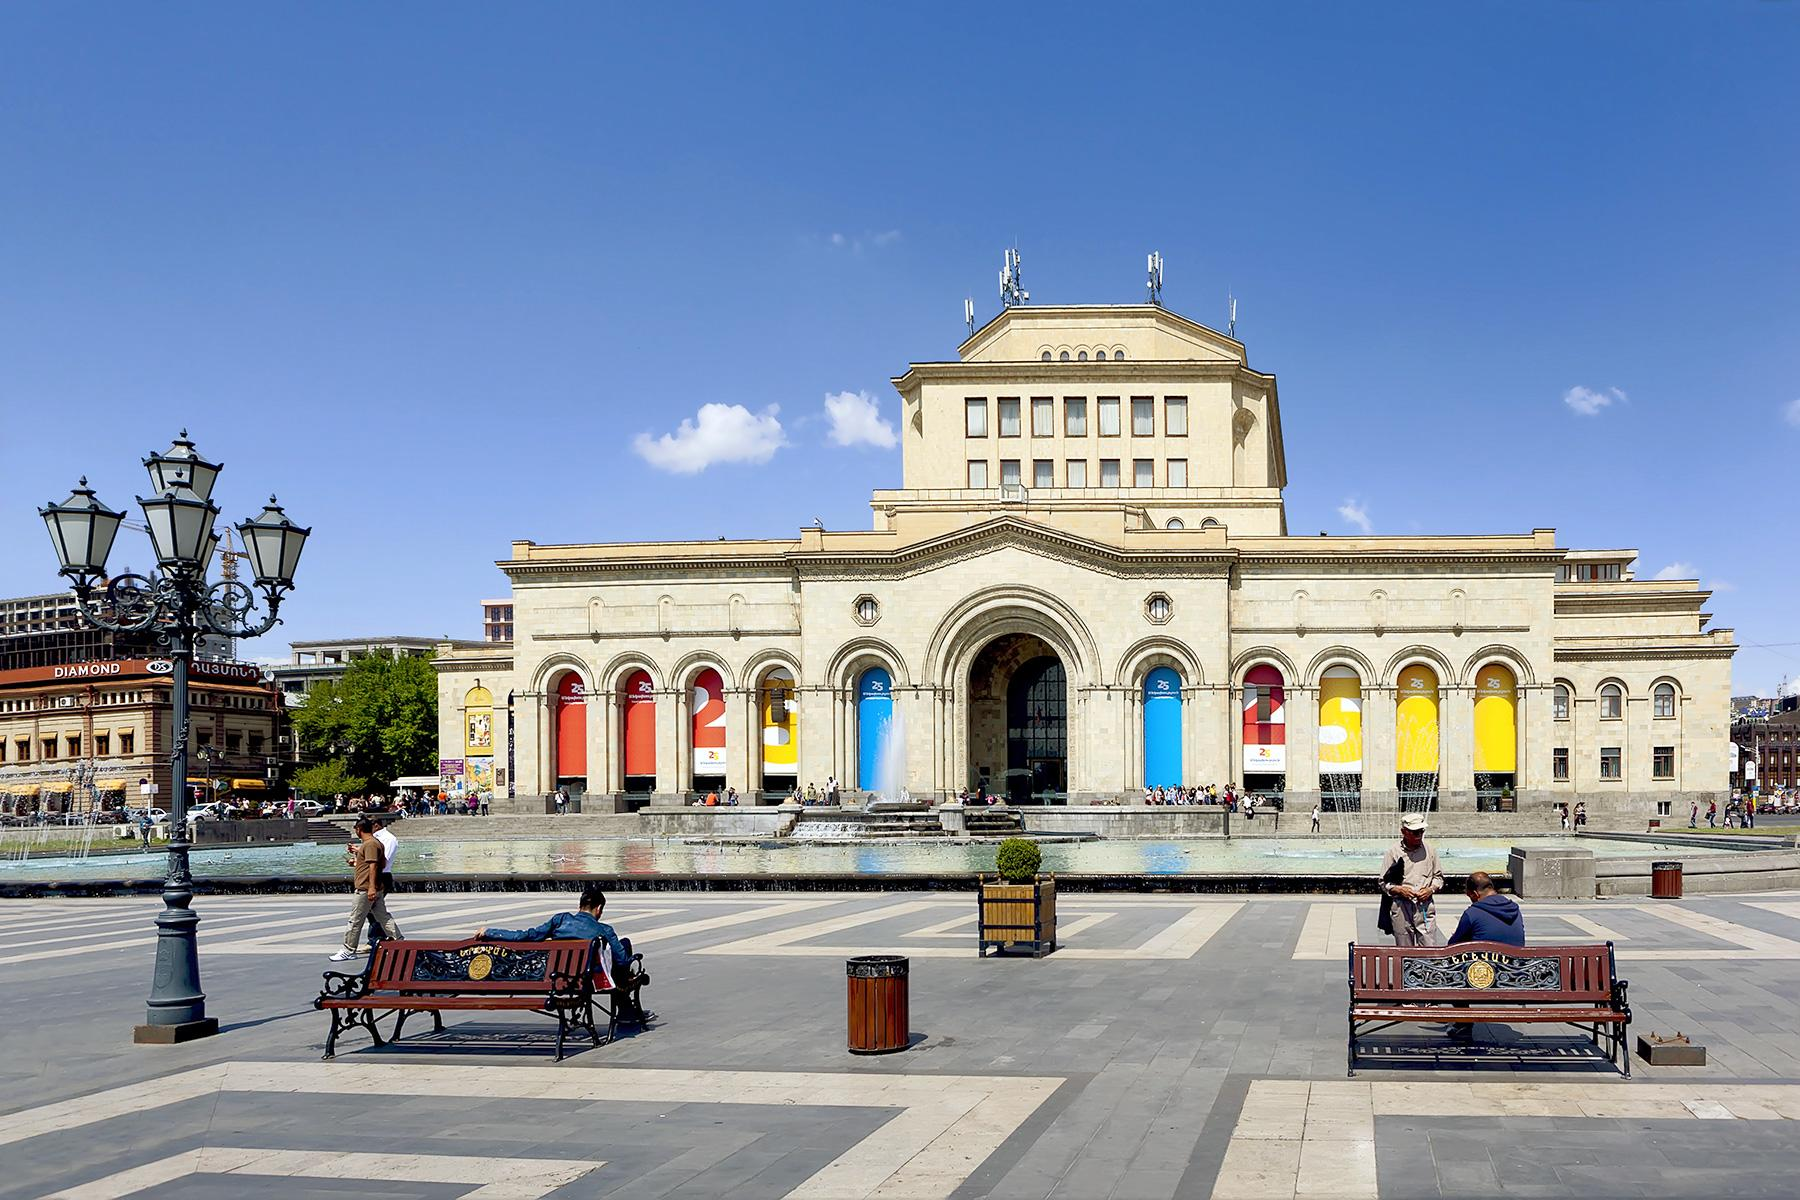 14_YervanArmenia_Museums_shutterstock_637251688_1